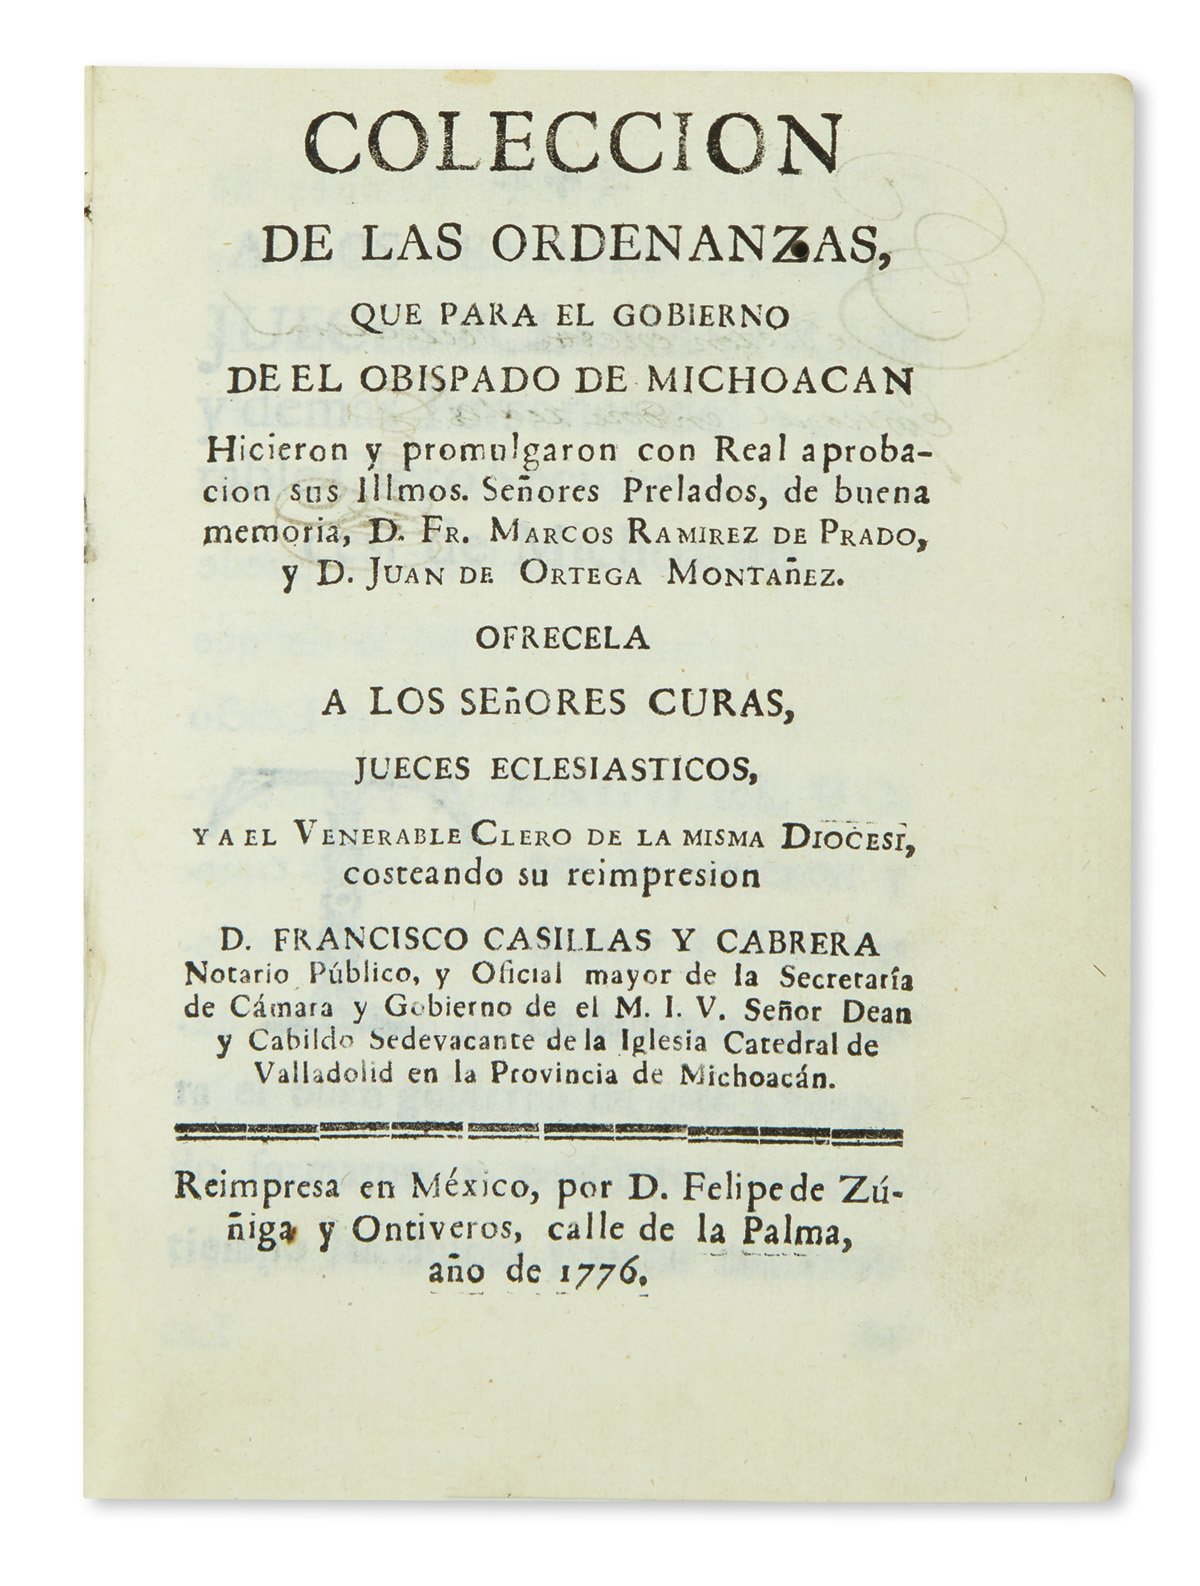 (MEXICAN-IMPRINT--1776)-Ramirez-de-Prado-Marcos;-and-Juan-de